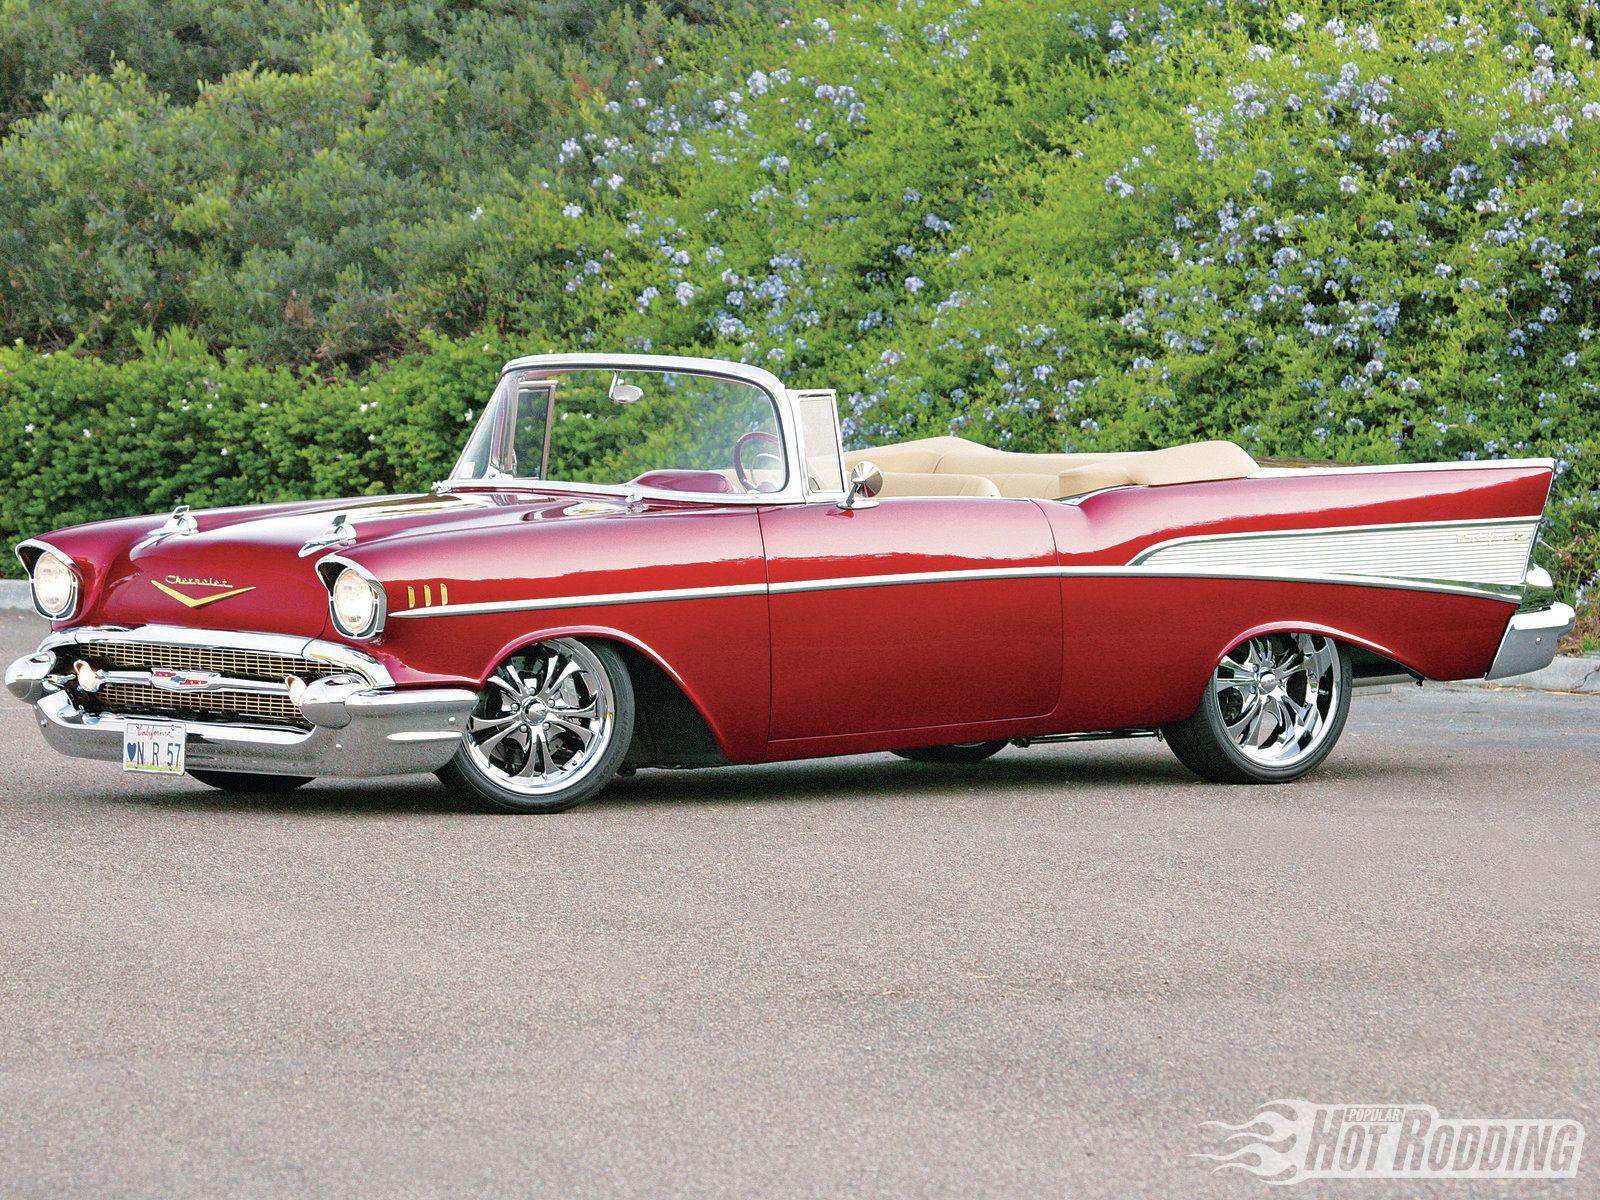 Hot 57 Chevy Vert Chevy Bel Air 1957 Chevy Bel Air 57 Chevy